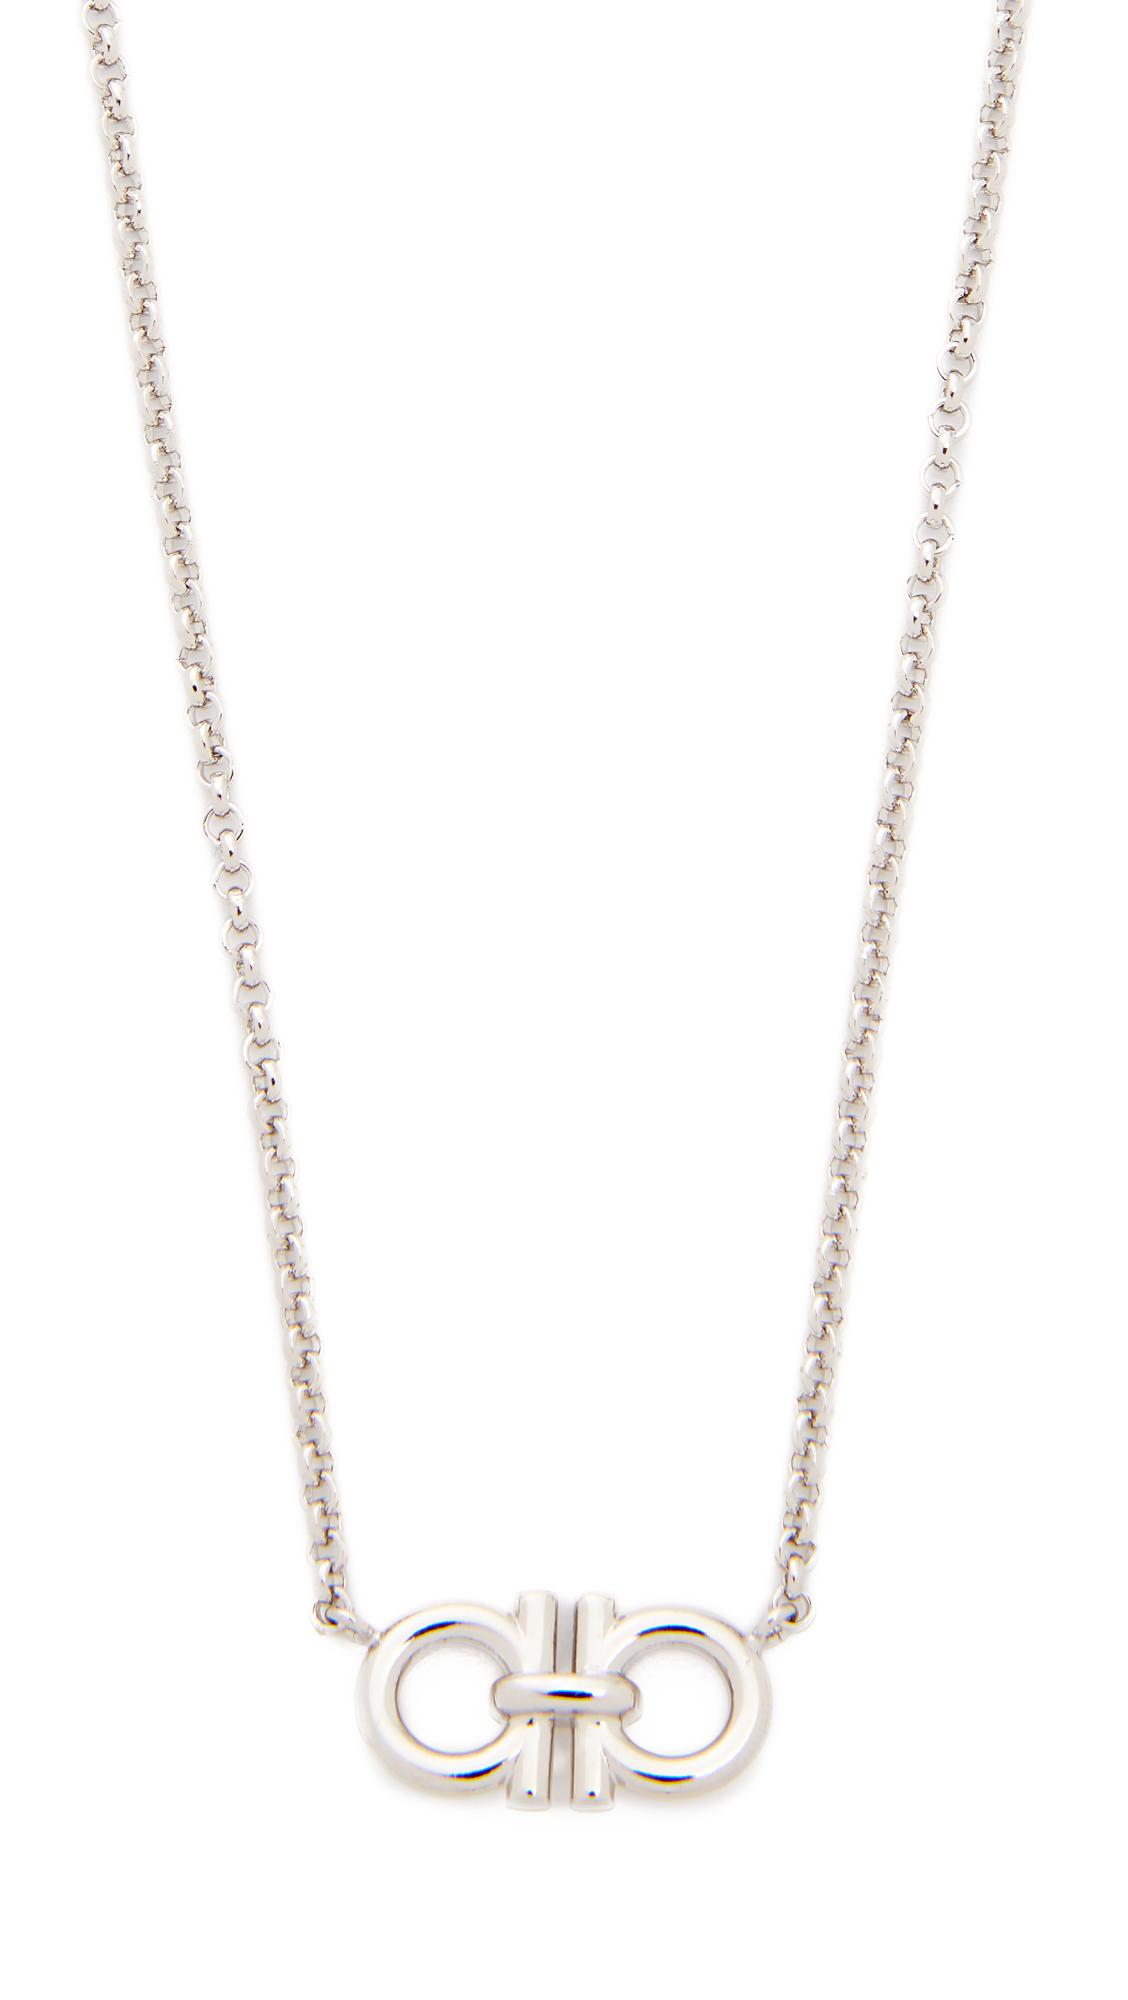 Salvatore Ferragamo Double Gancio Necklace In Silver